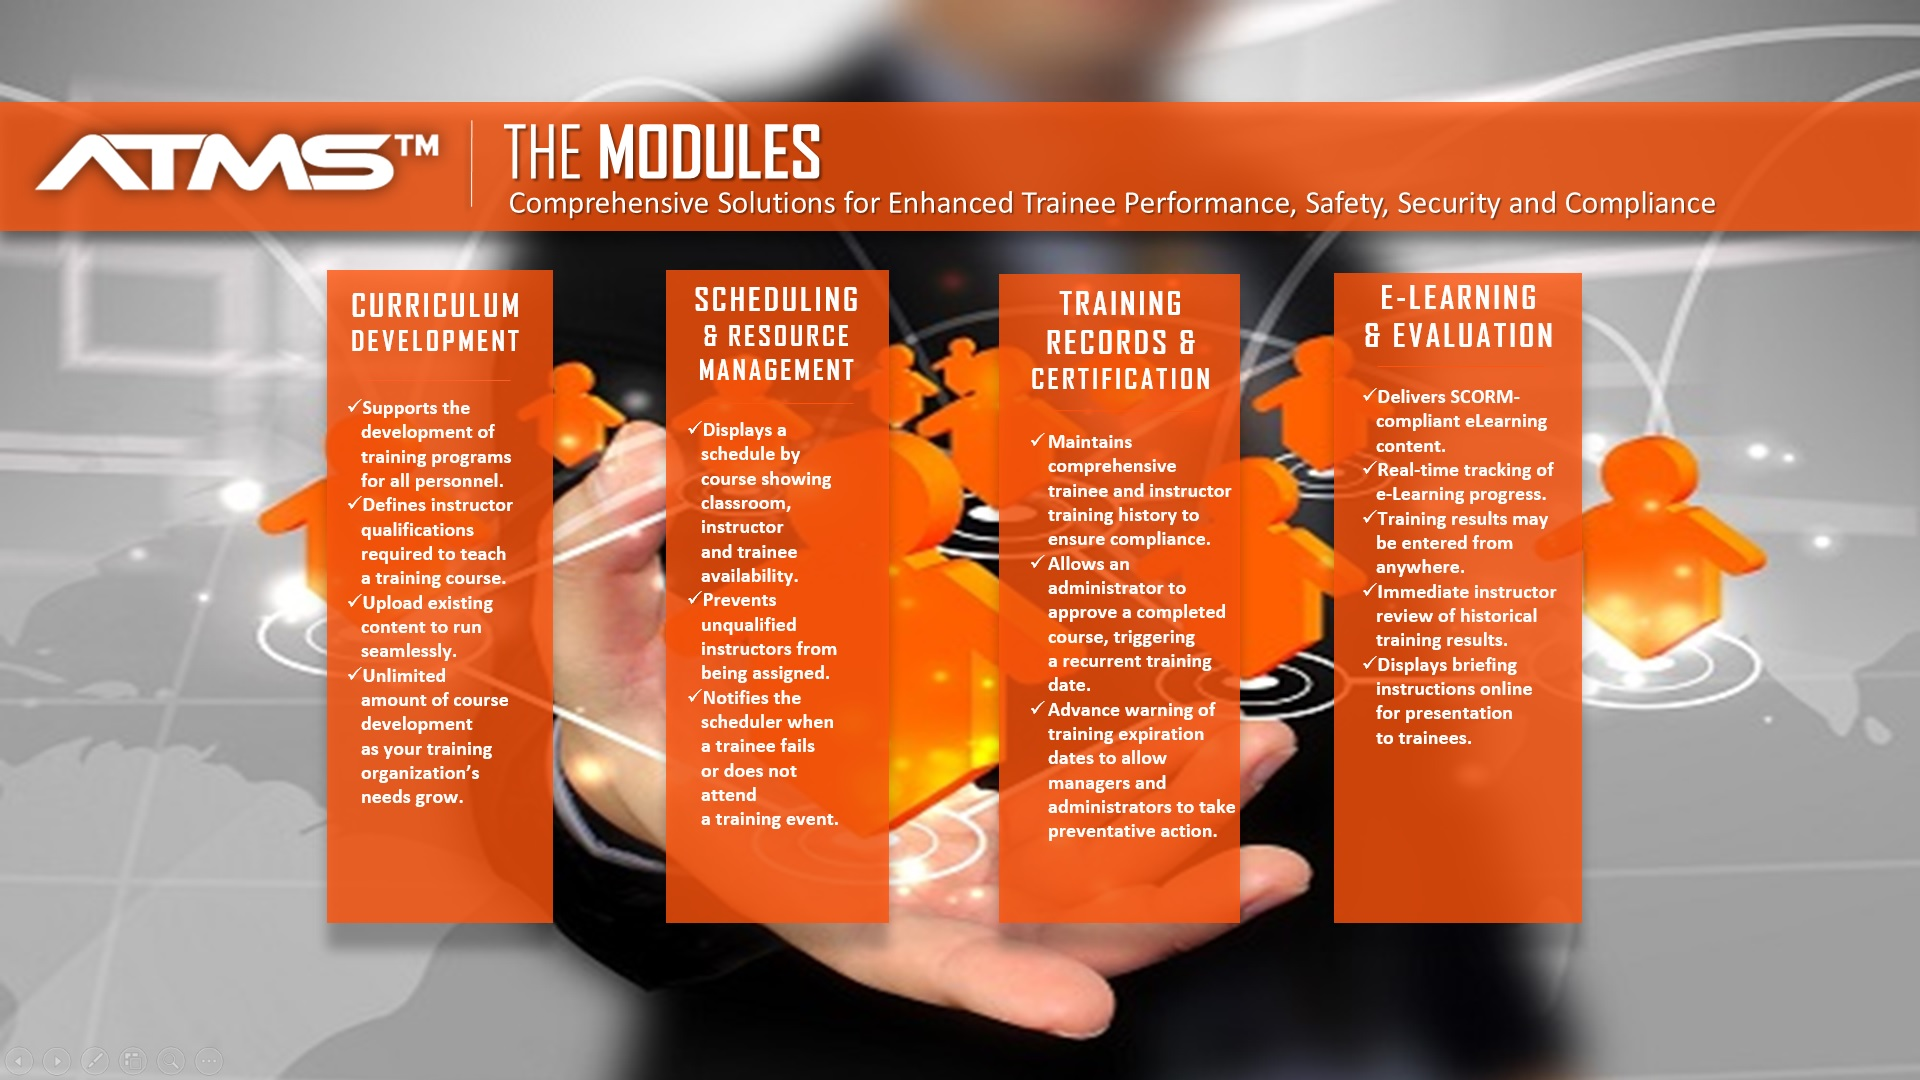 ATMS-Advance-Training-Management-System-Slide-5-1